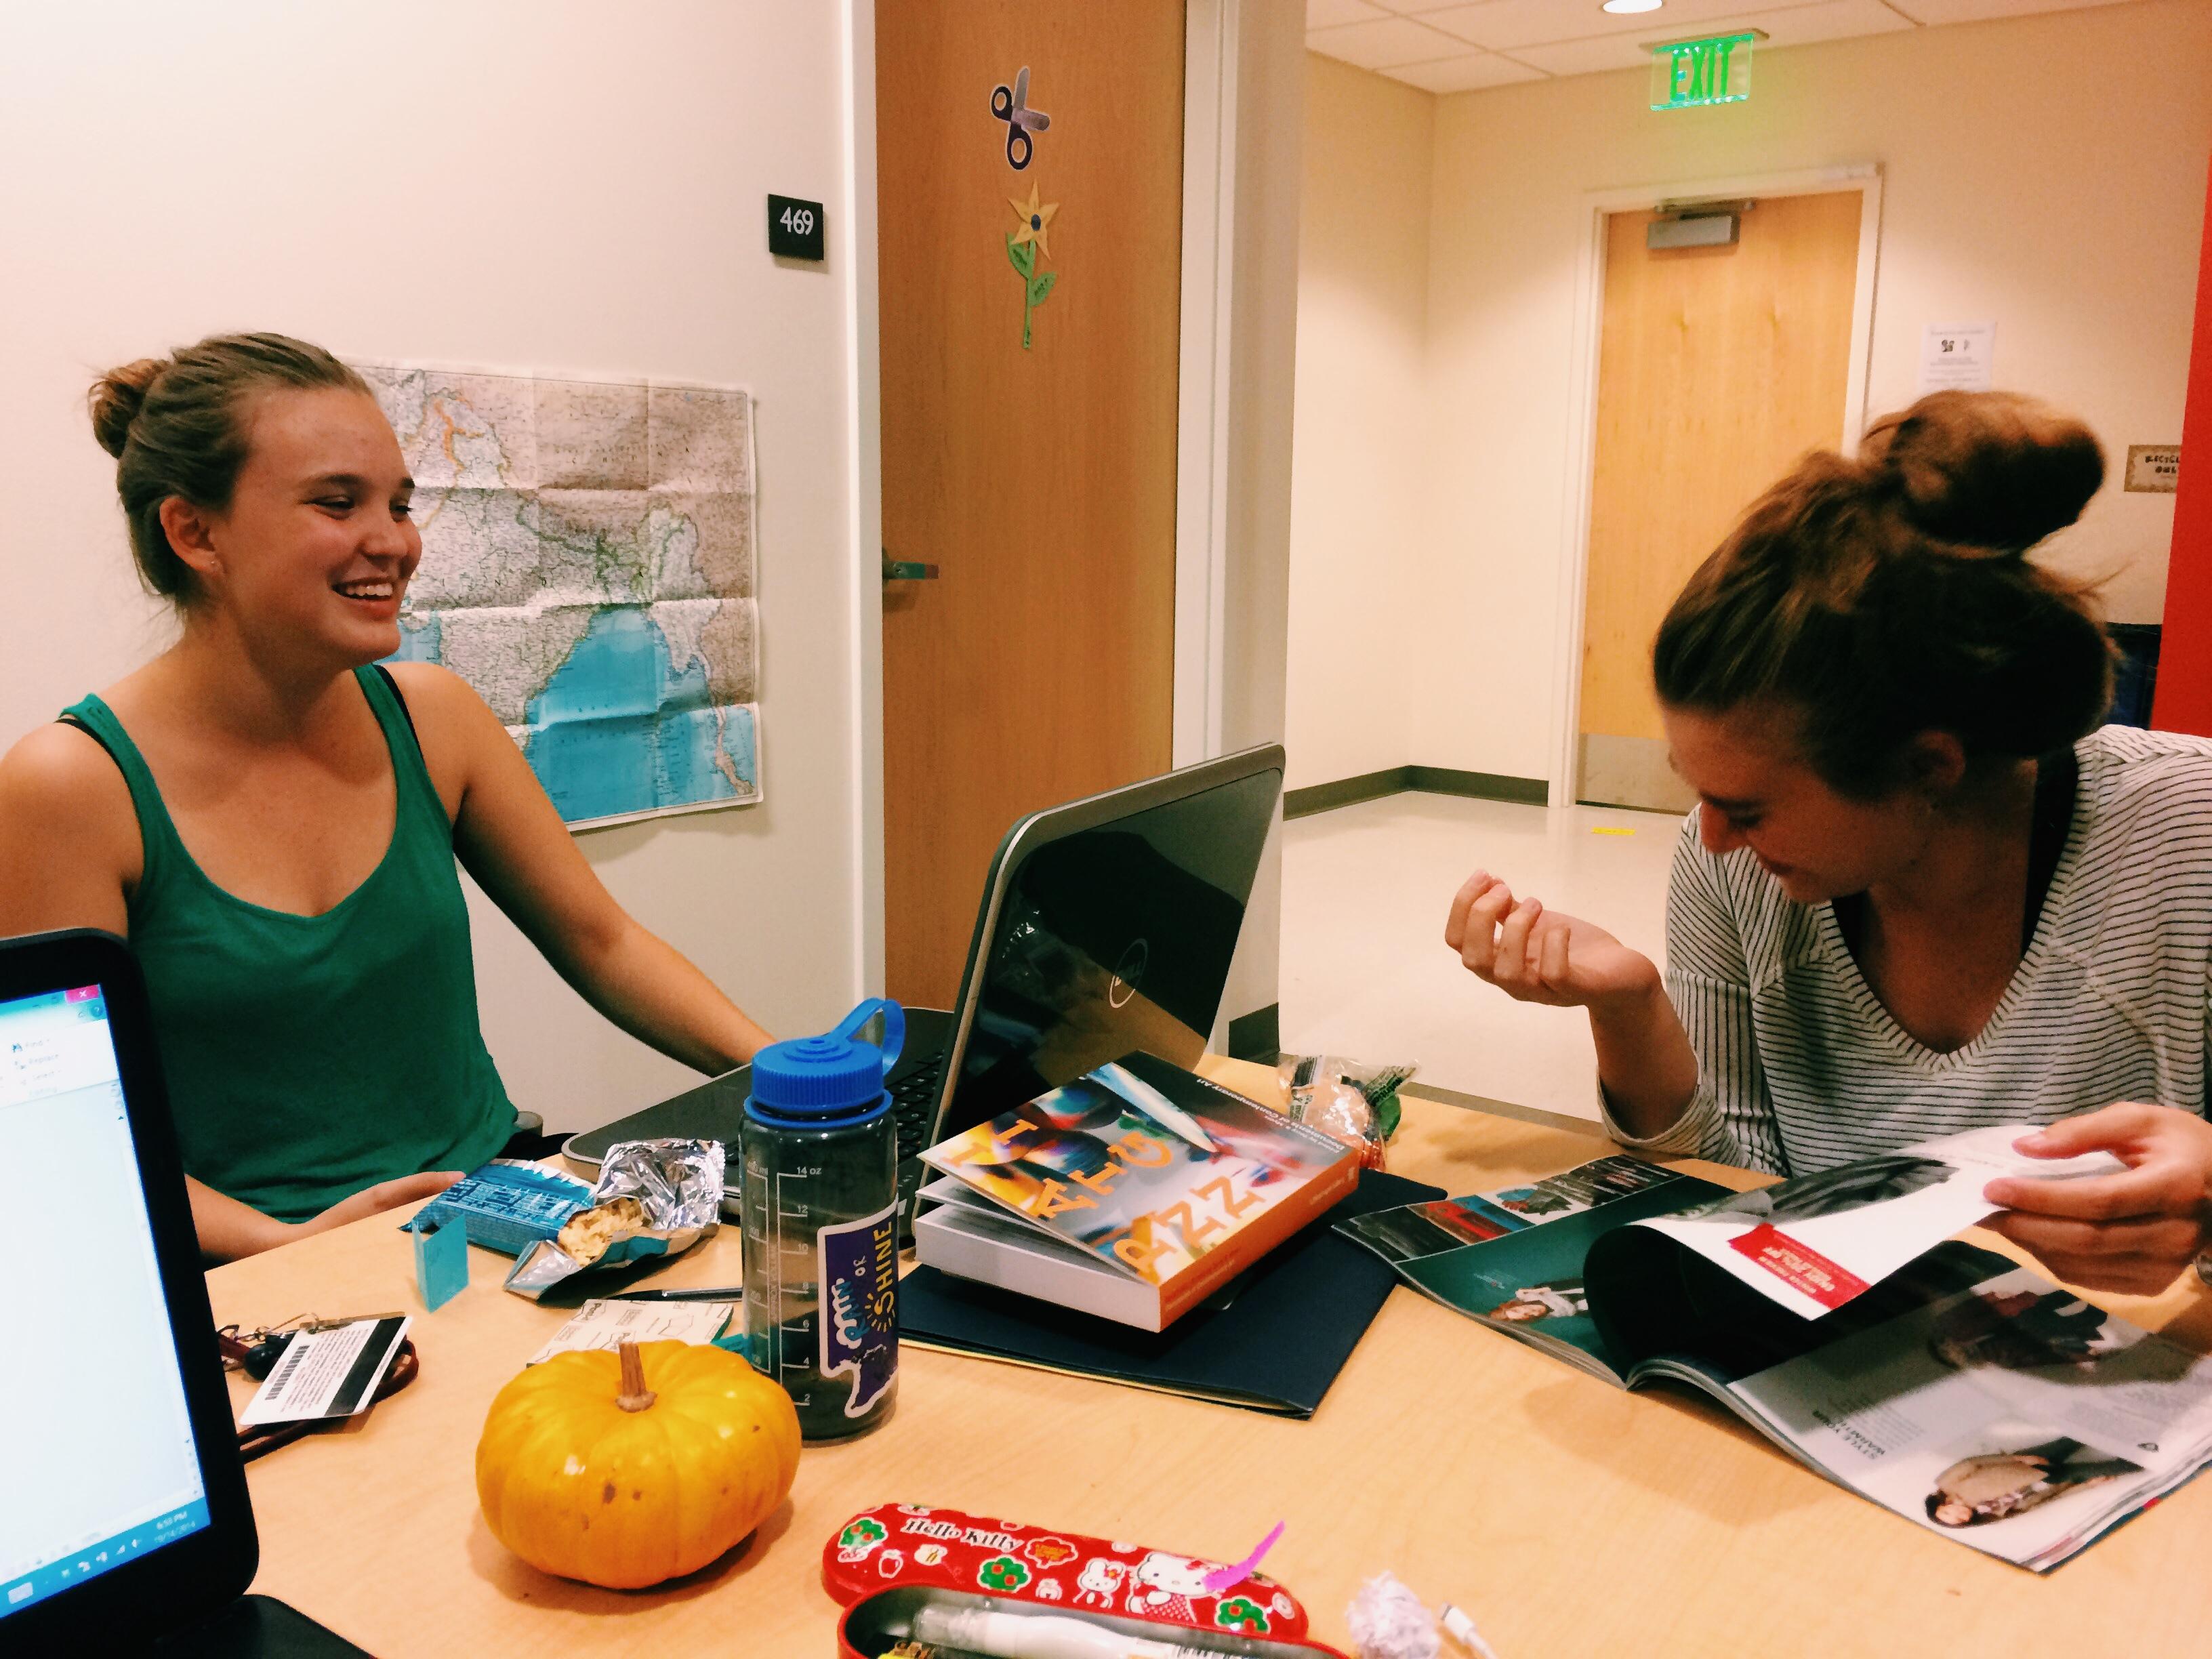 Midterm study giggles!